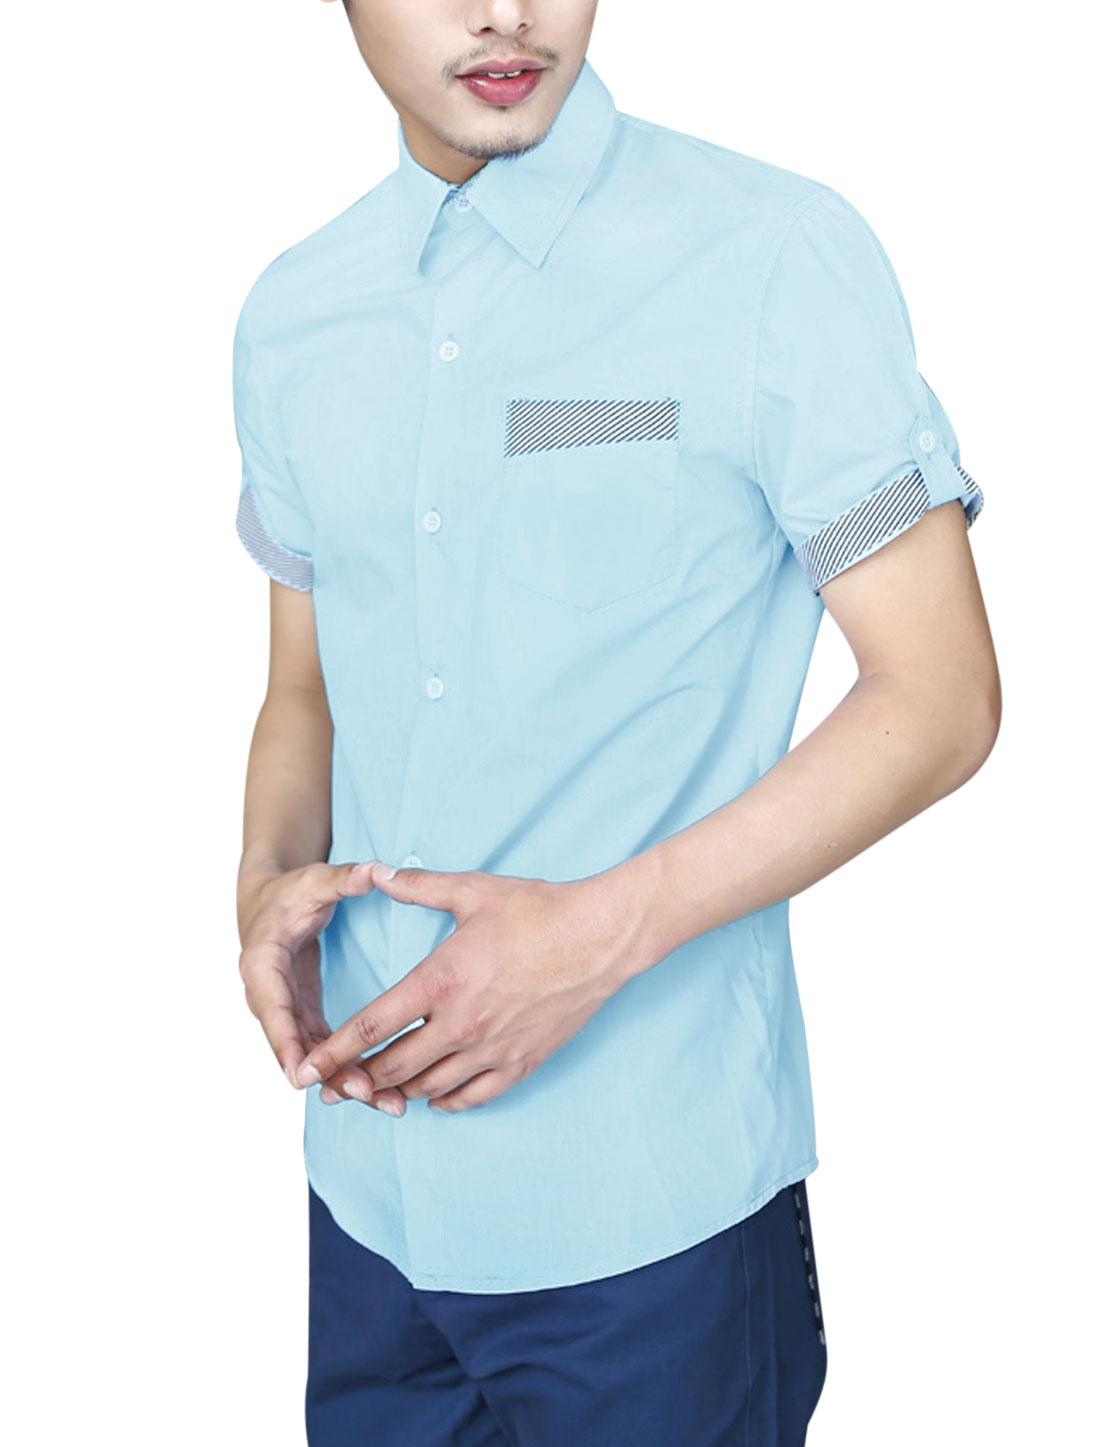 Men Summer Stripes Detail Panel Point Collar Top Shirt Baby Blue M